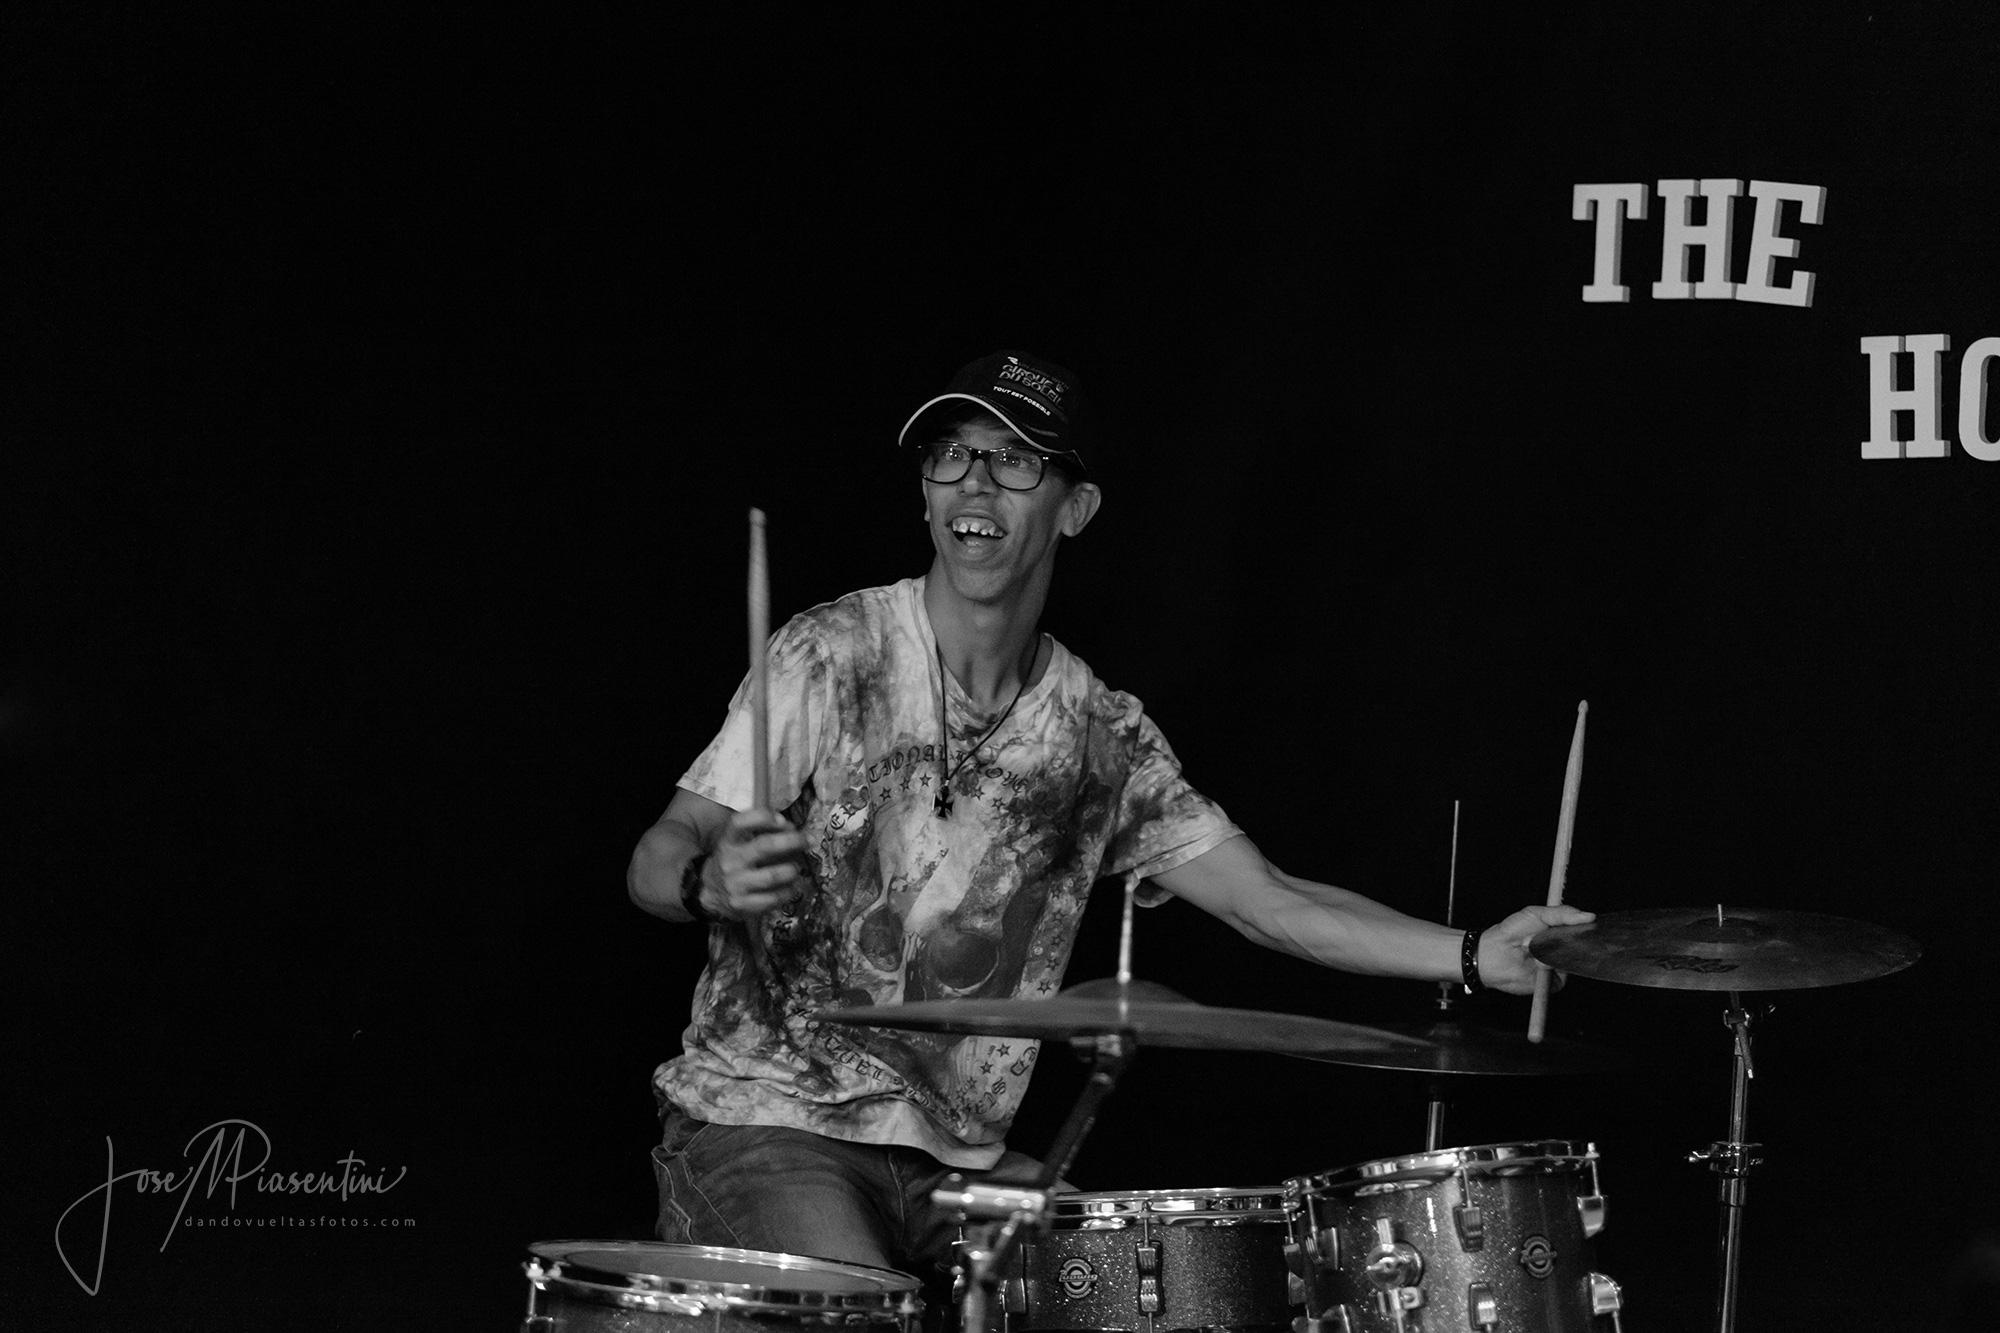 The-Harlem-Jam-session-Andorra